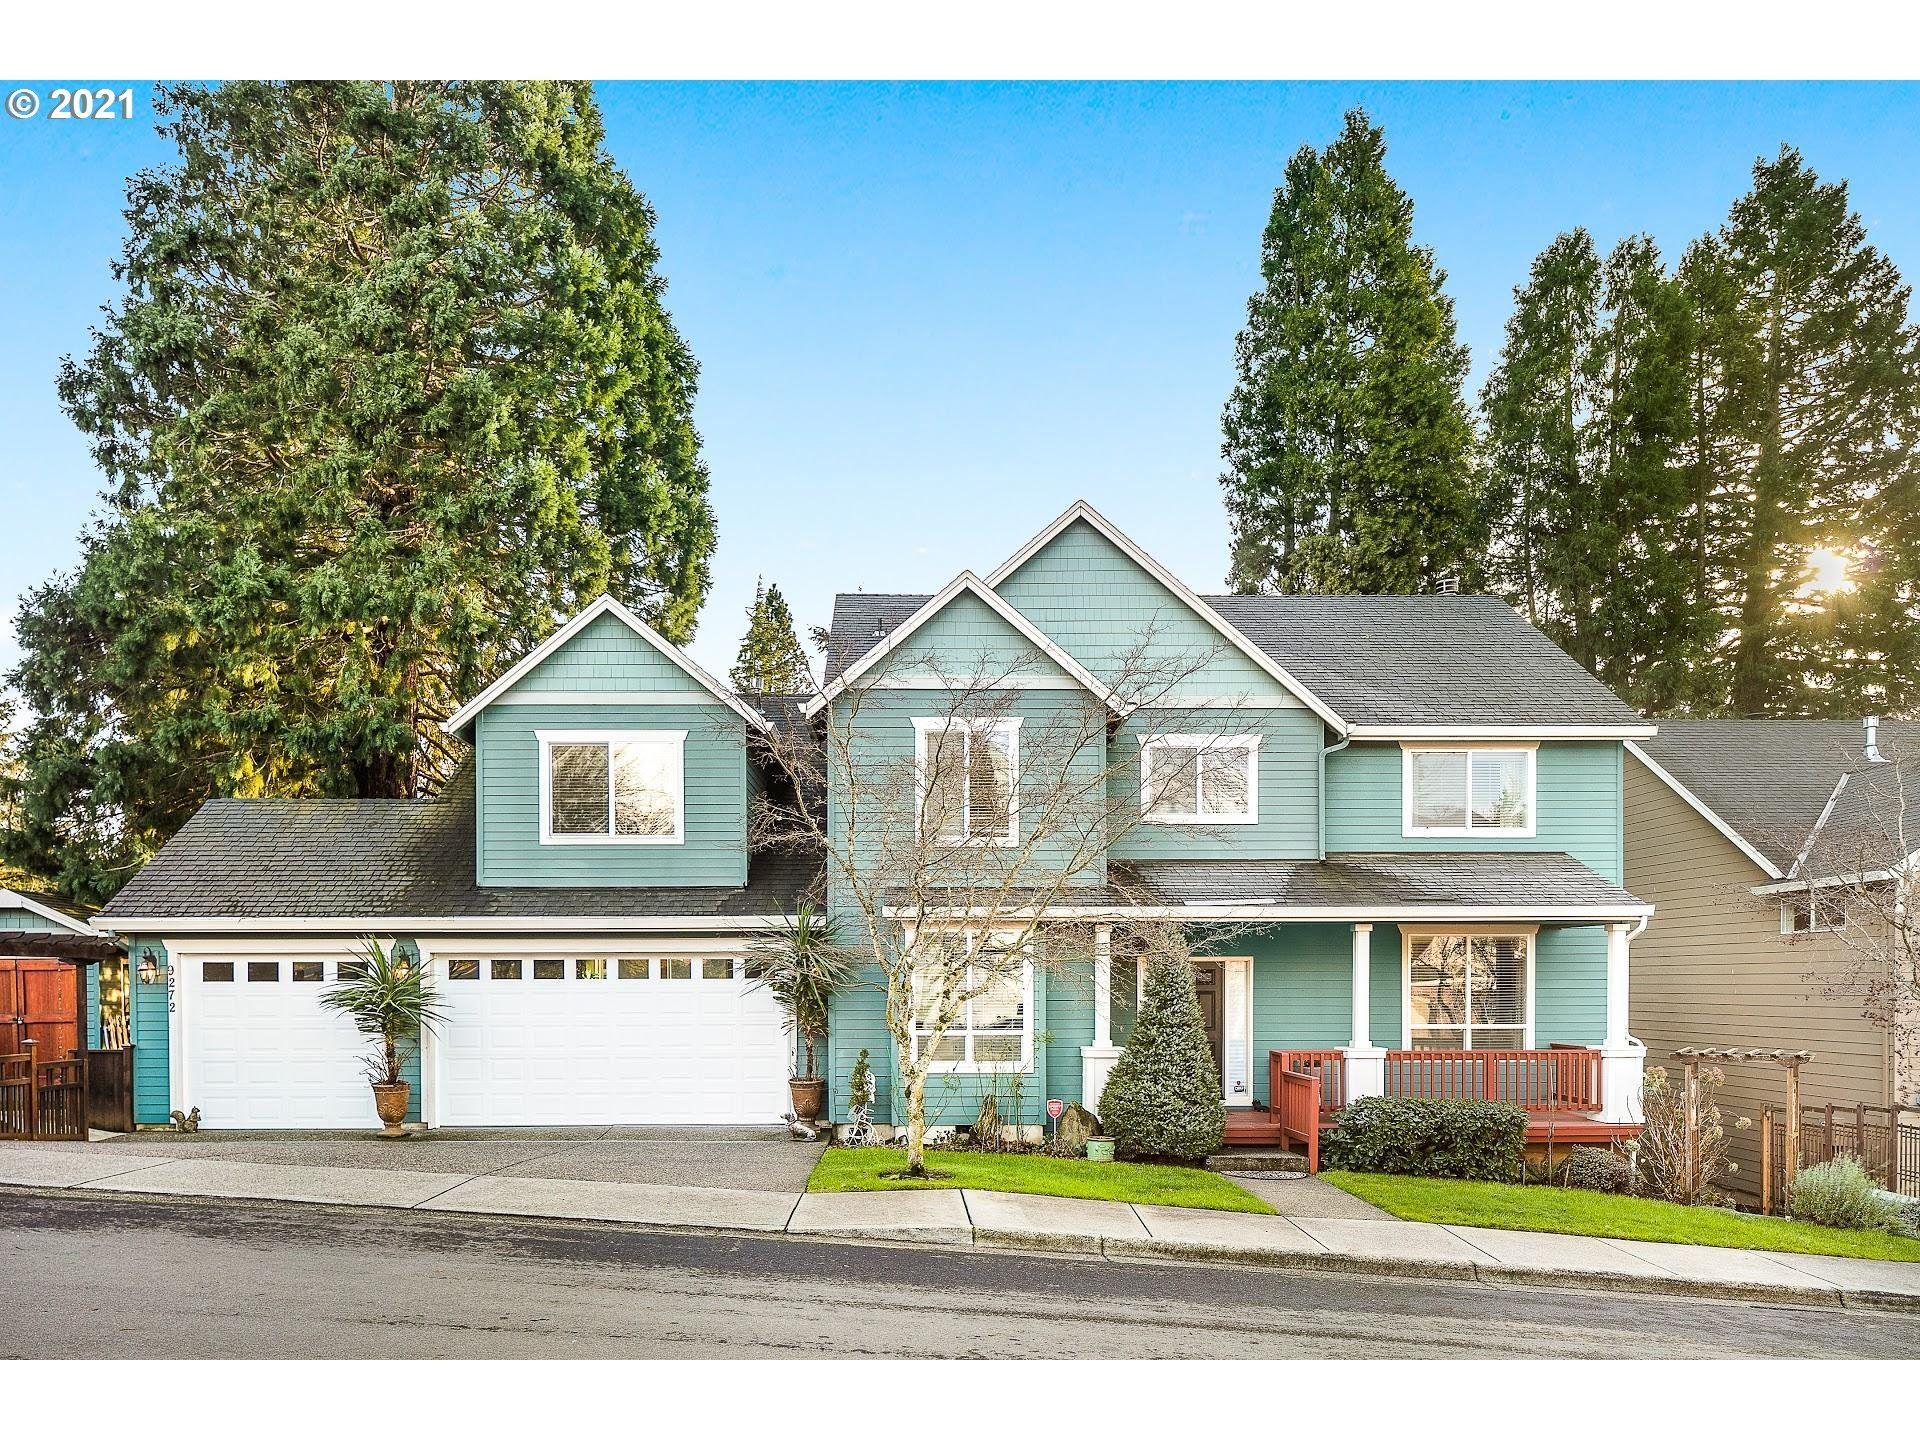 Photo for 9272 NW Murlea LN, Portland, OR 97229 (MLS # 21019508)